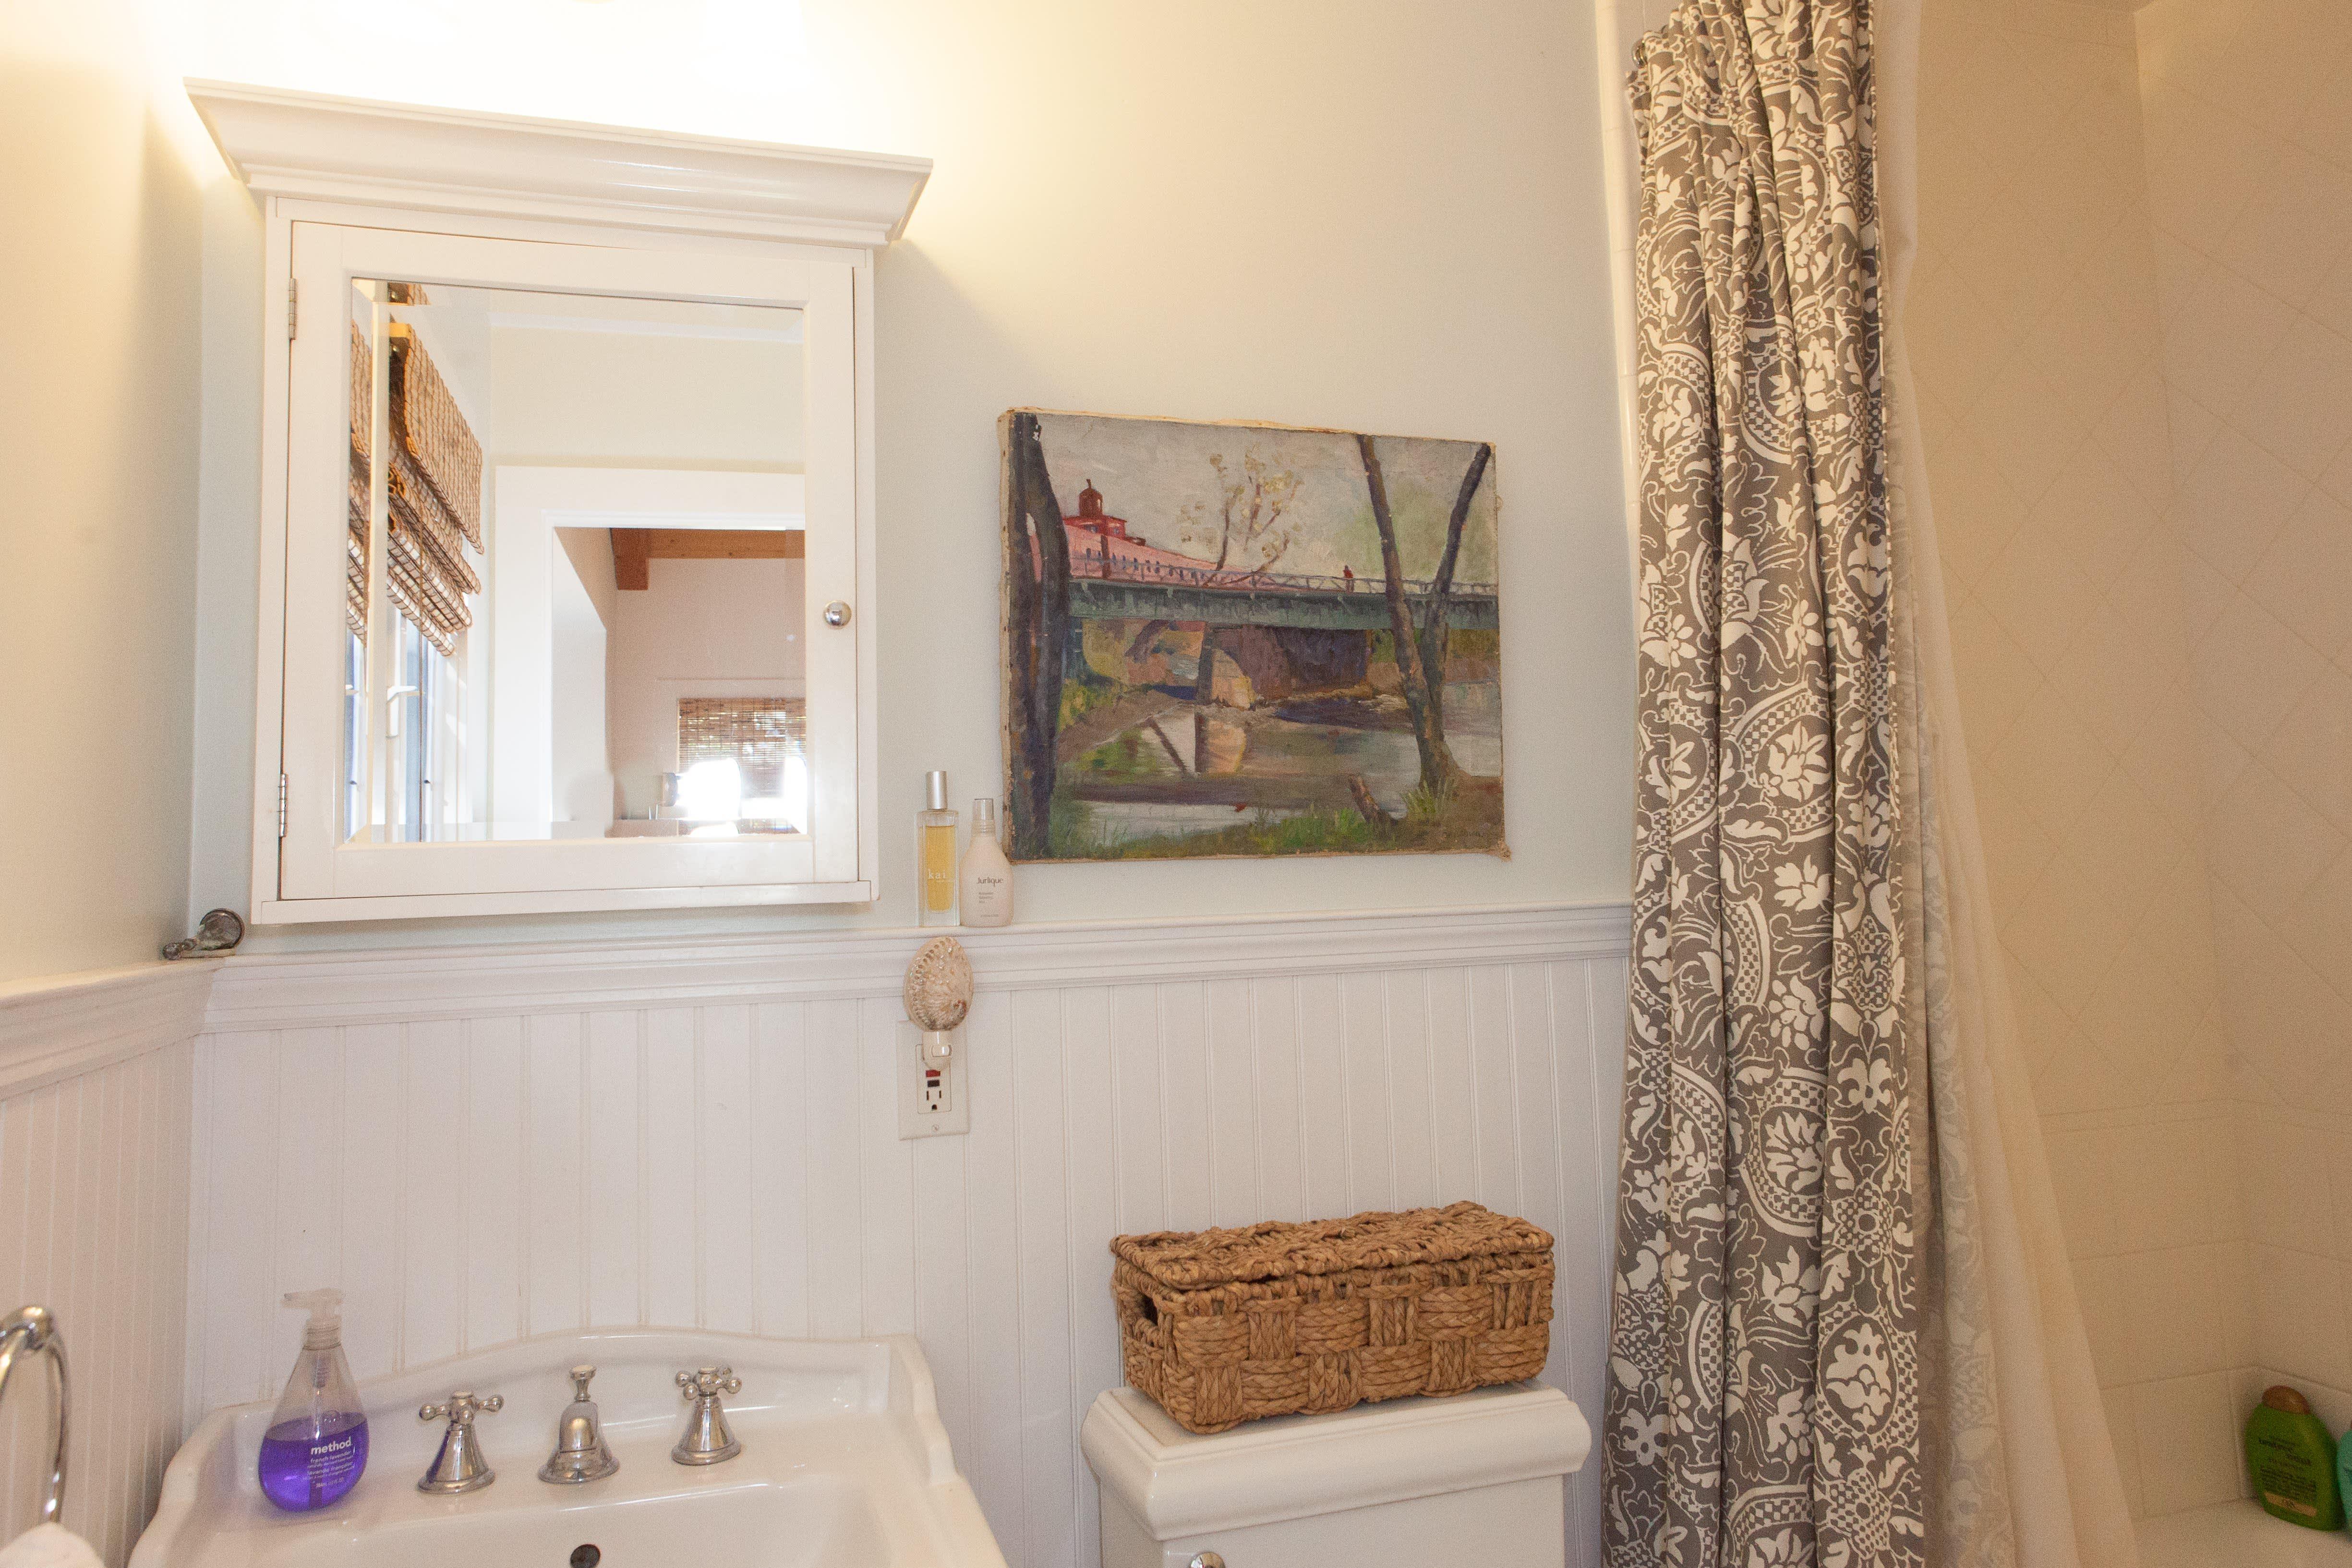 House Tour: A Sunny Santa Barbara Sanctuary | Apartment ...